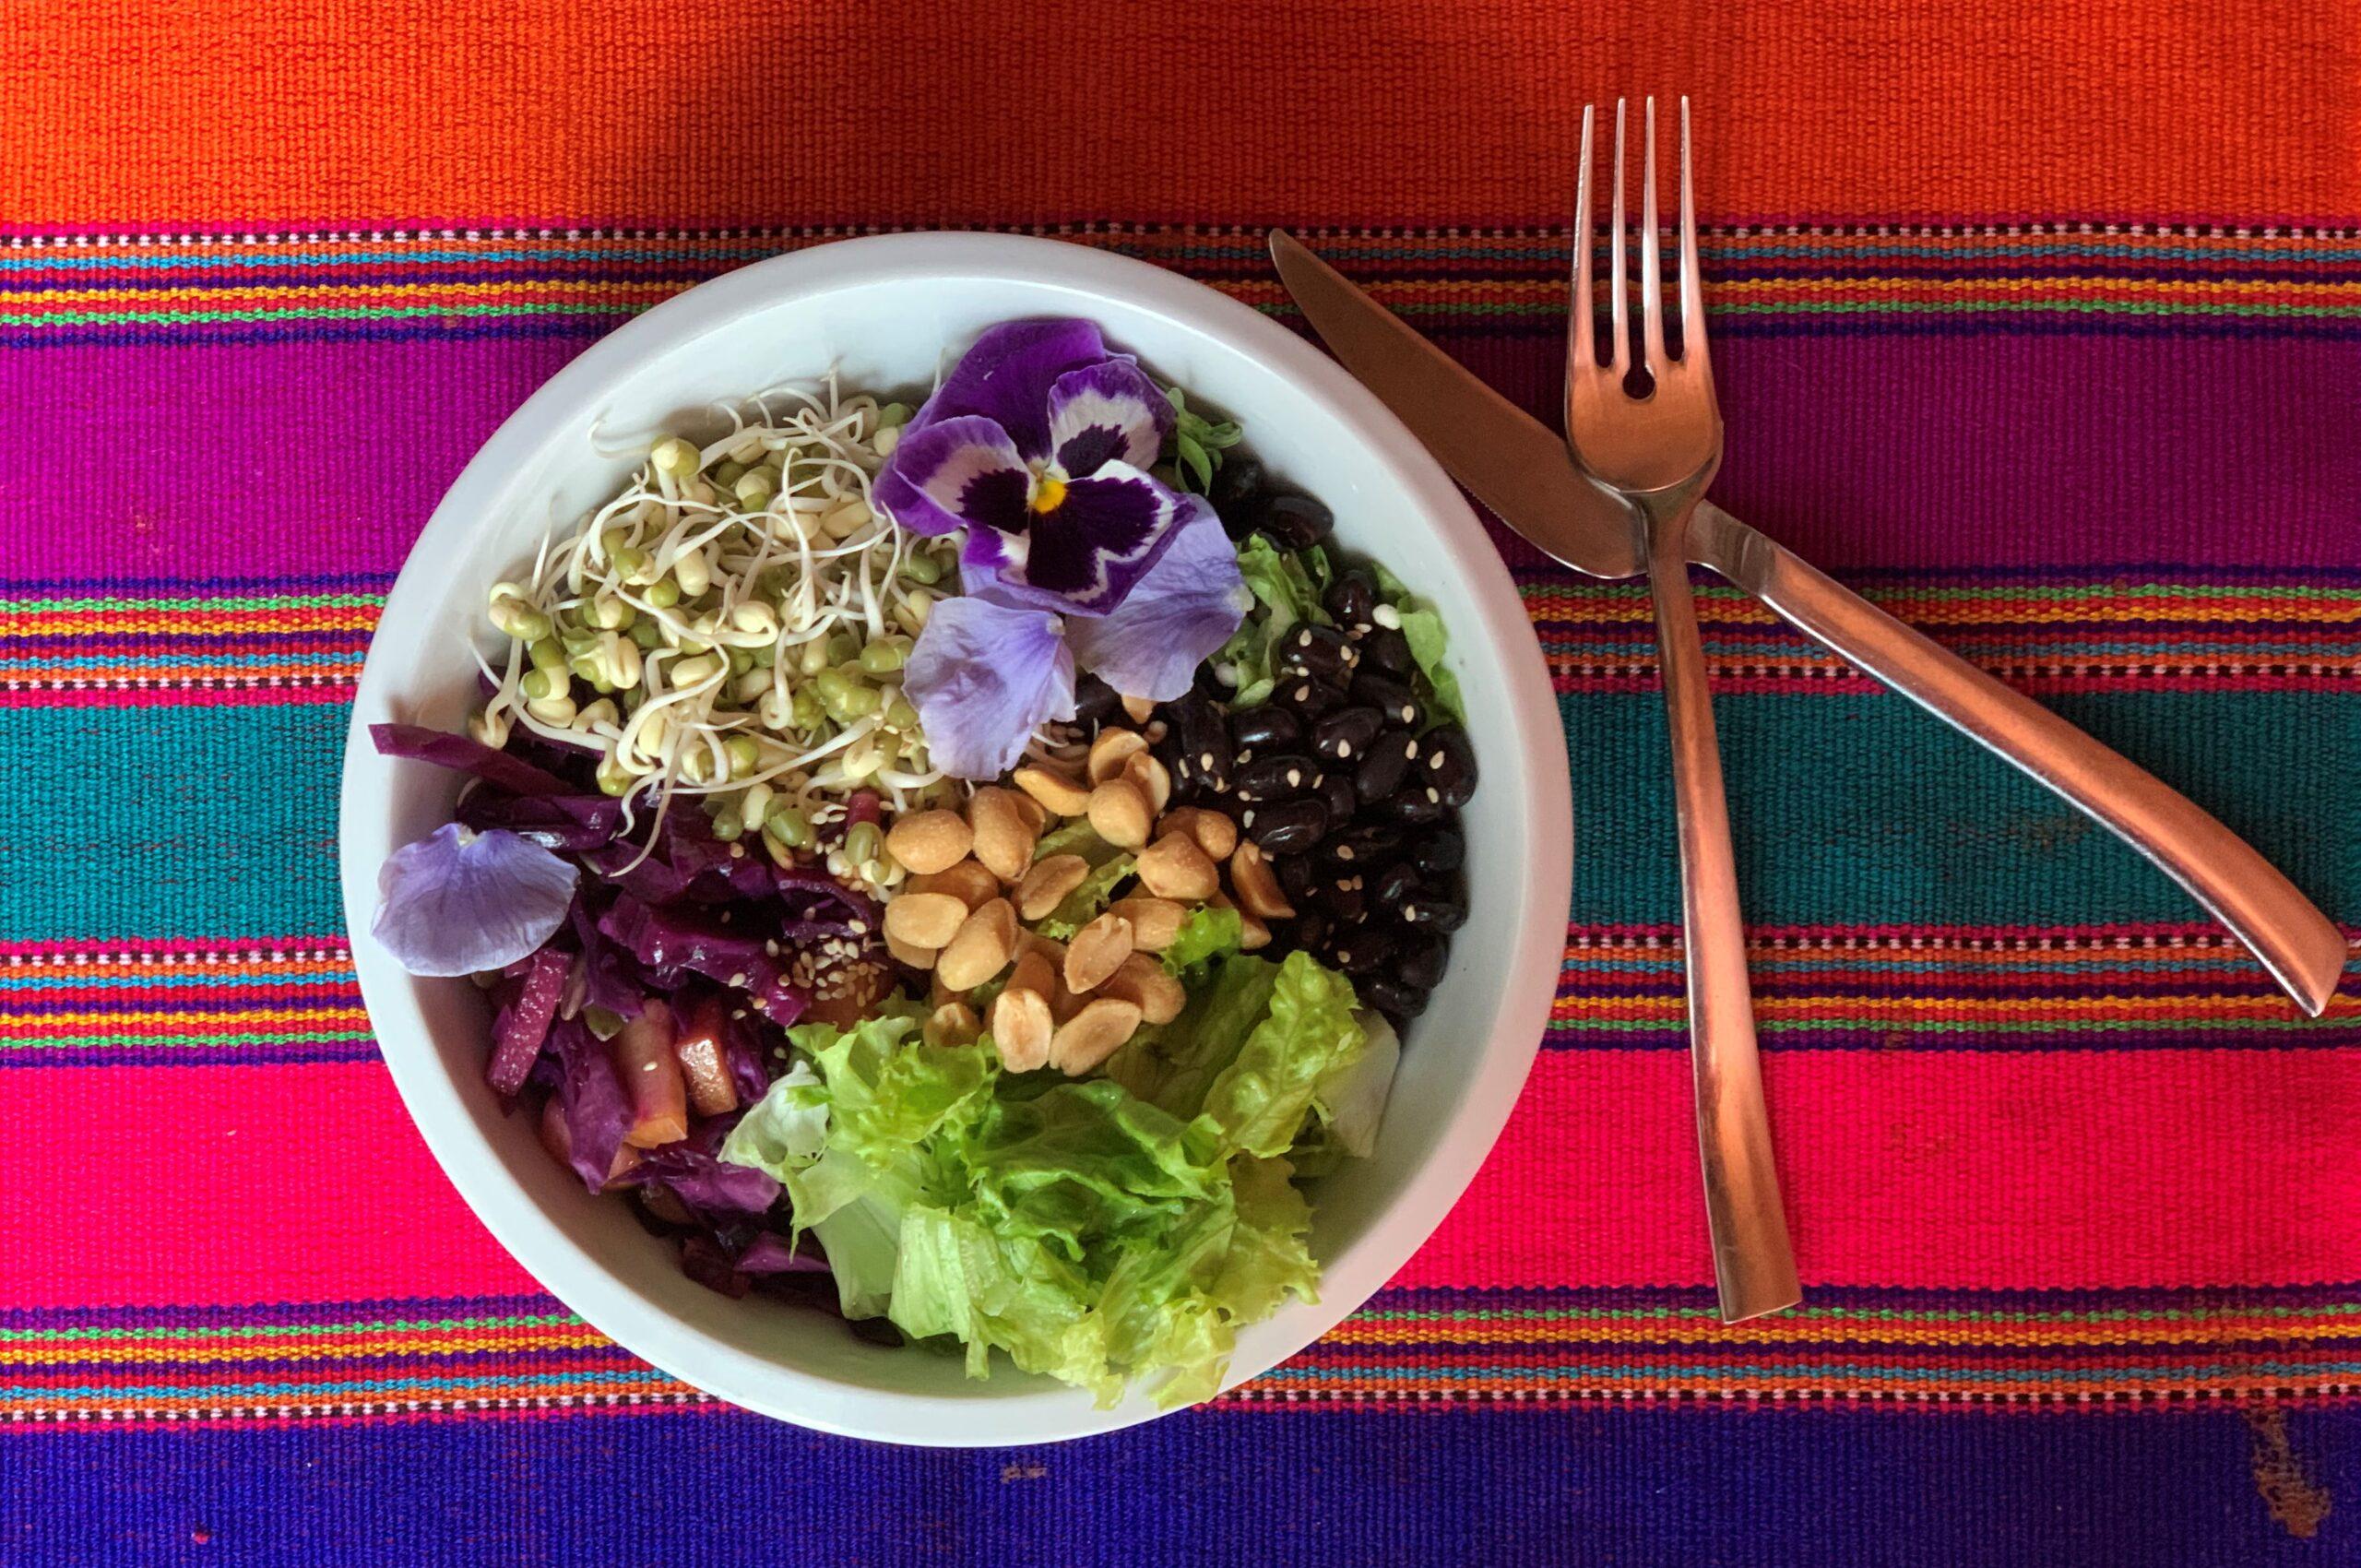 Nurishing salad